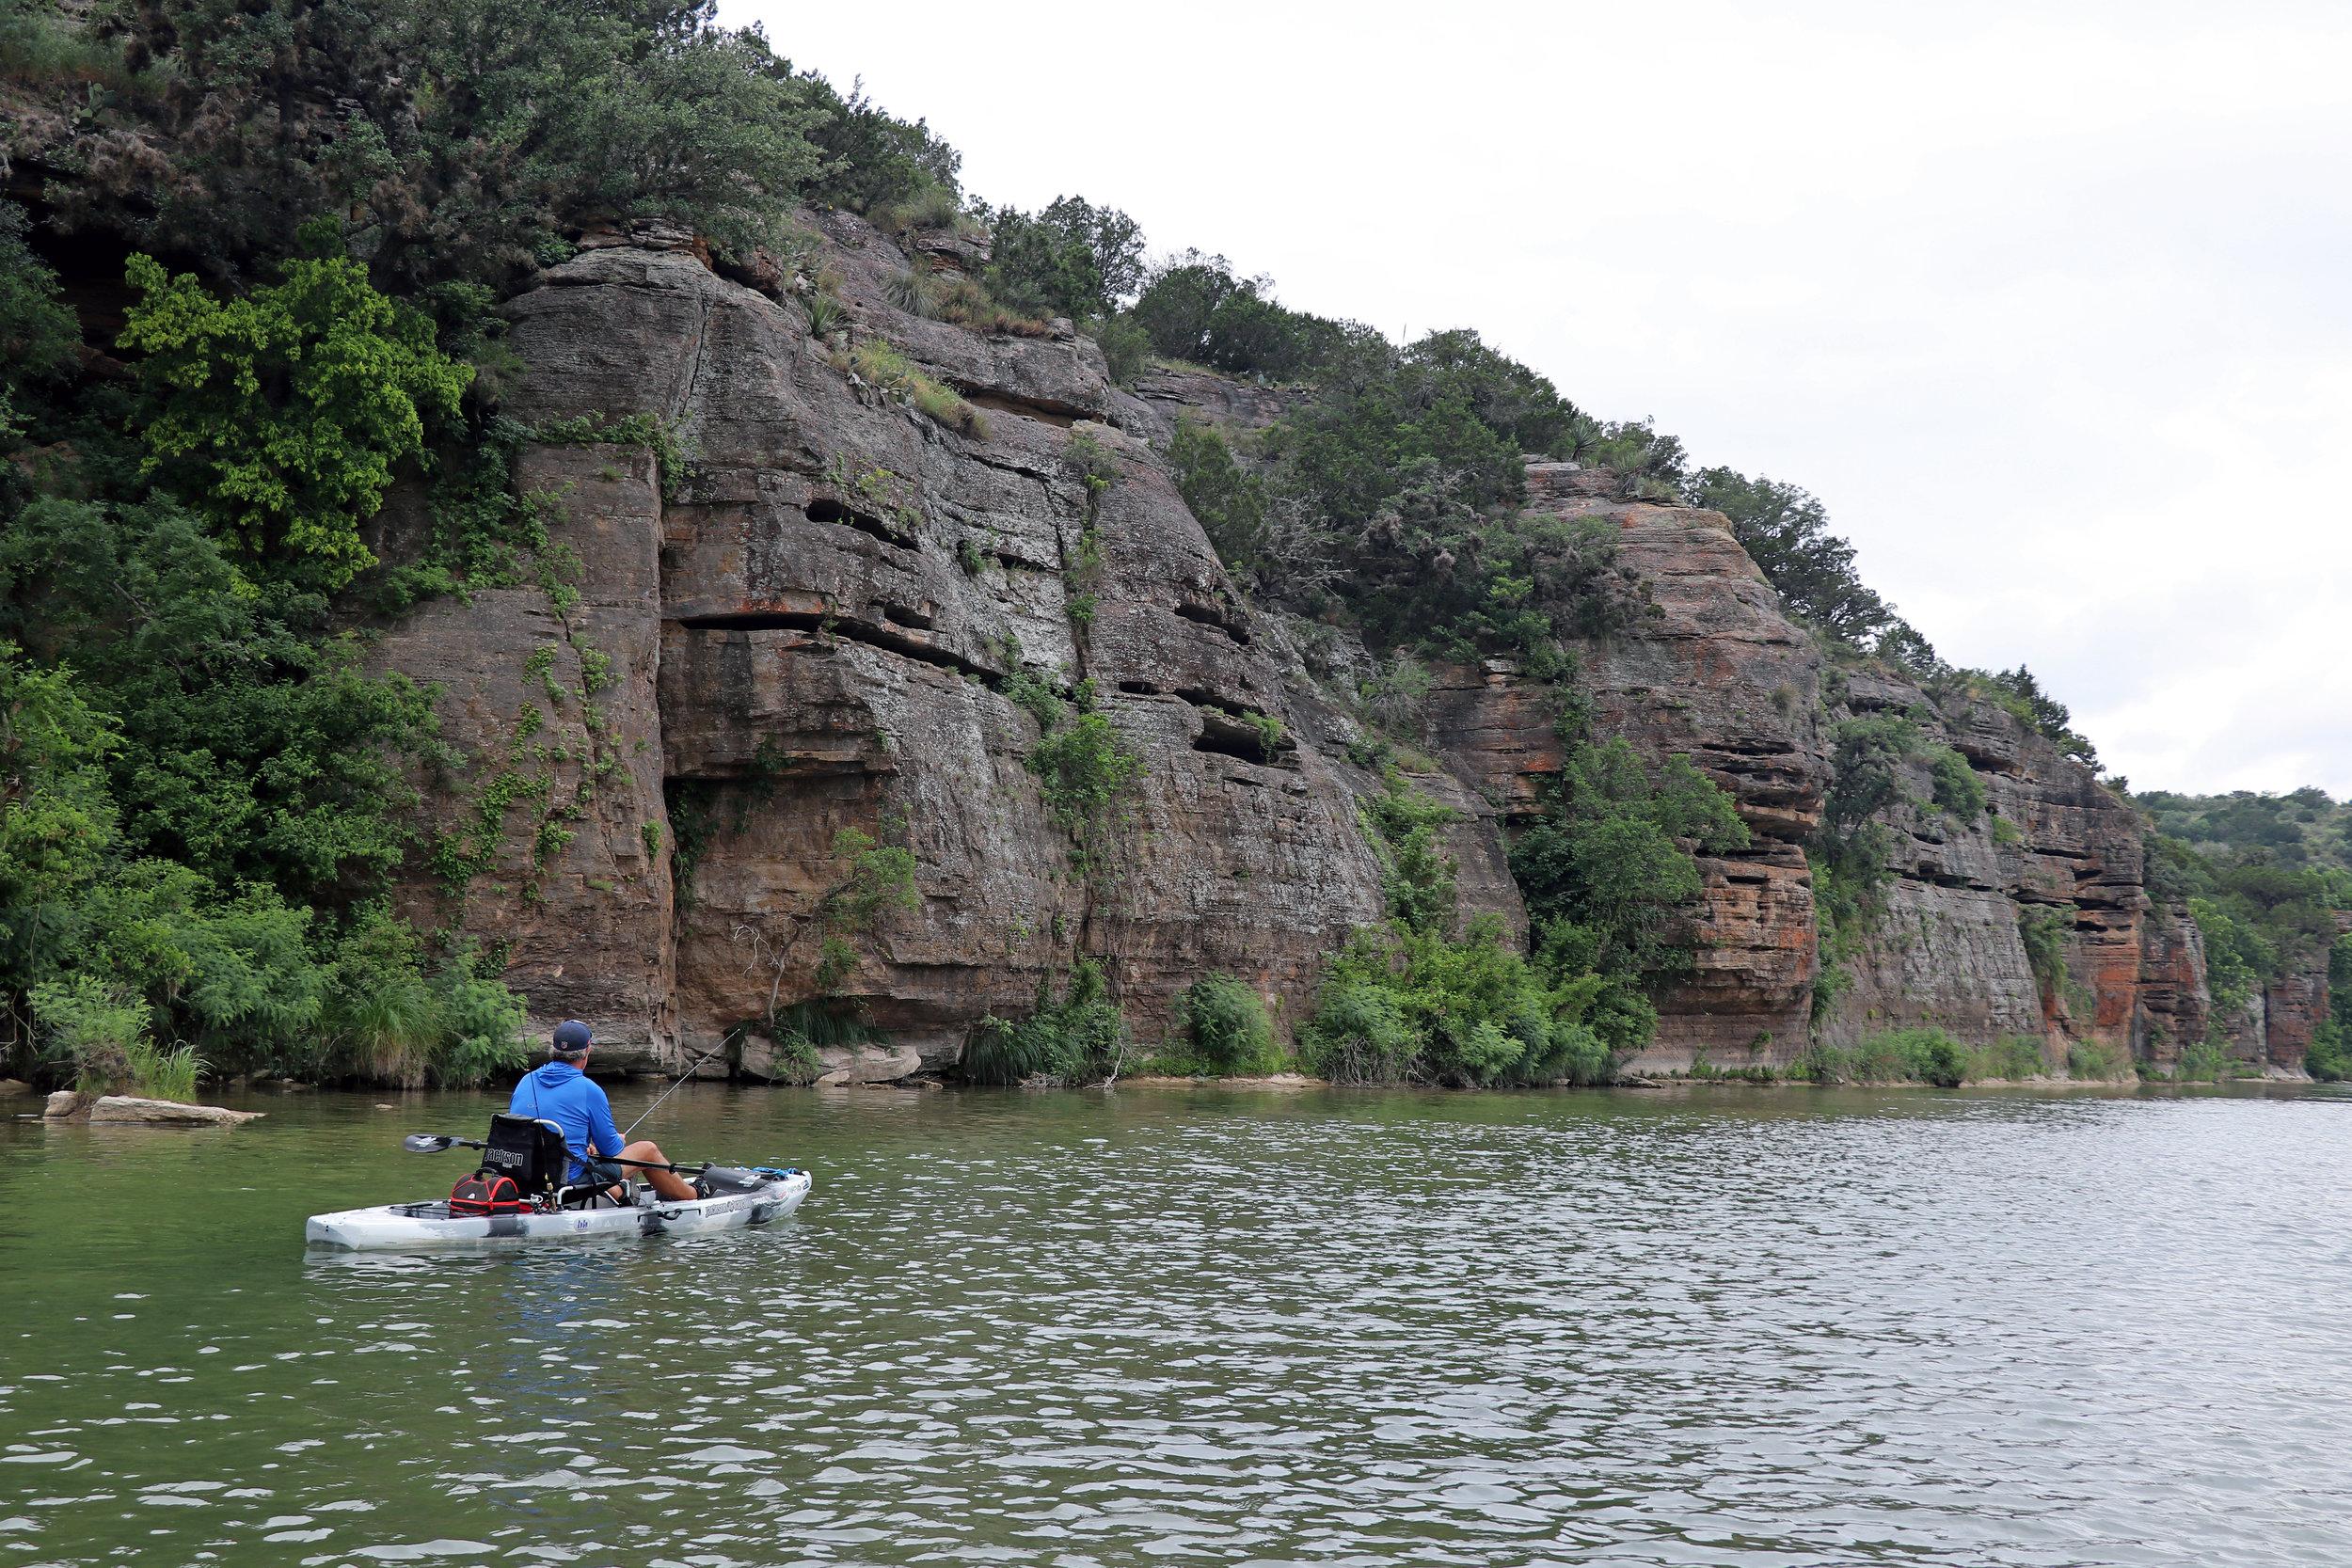 Jackson Kayak Liska Llano River